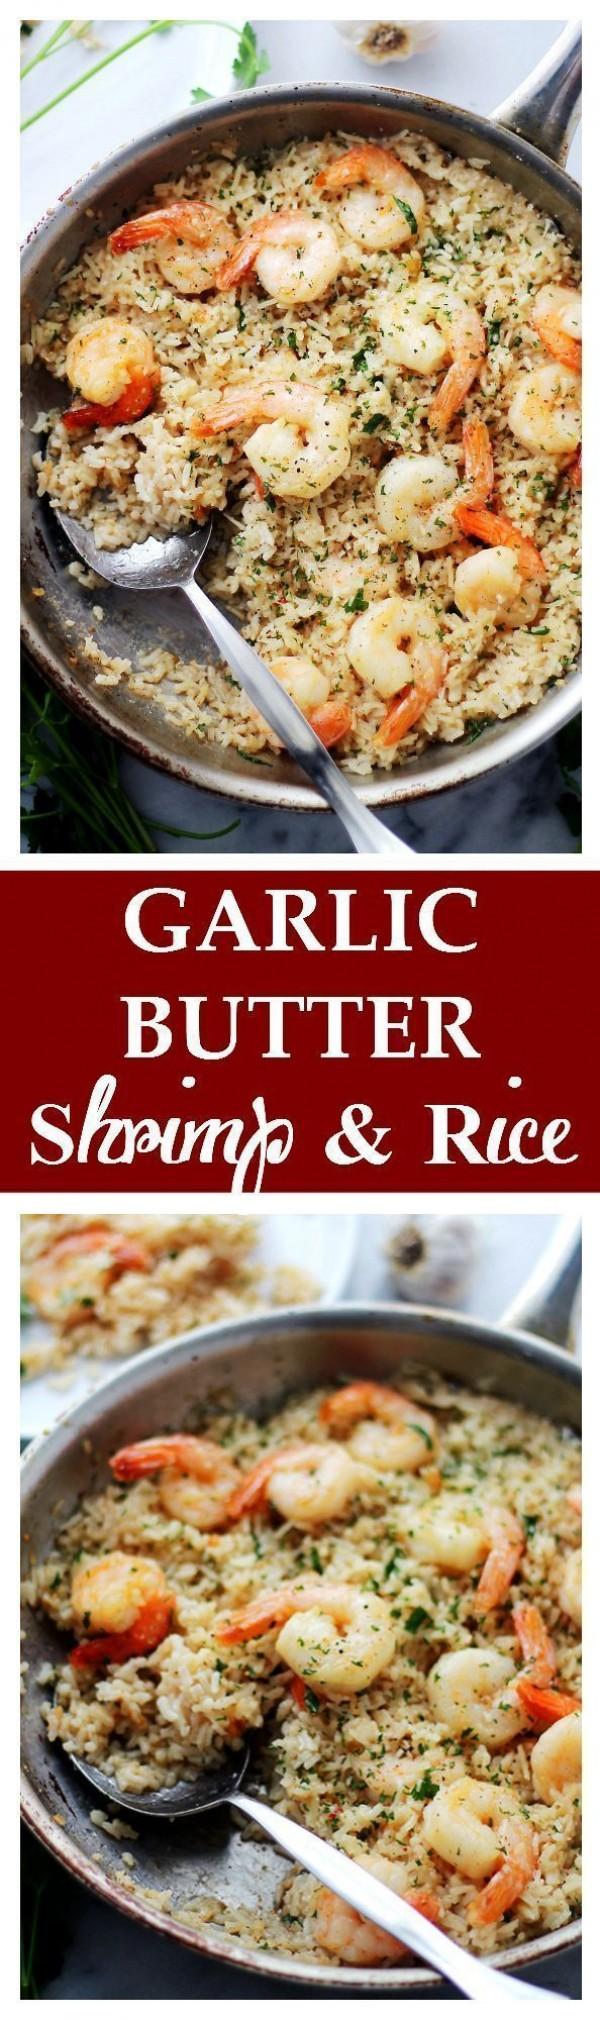 Get the recipe Garlic Butter Shrimp and Rice @recipes_to_go